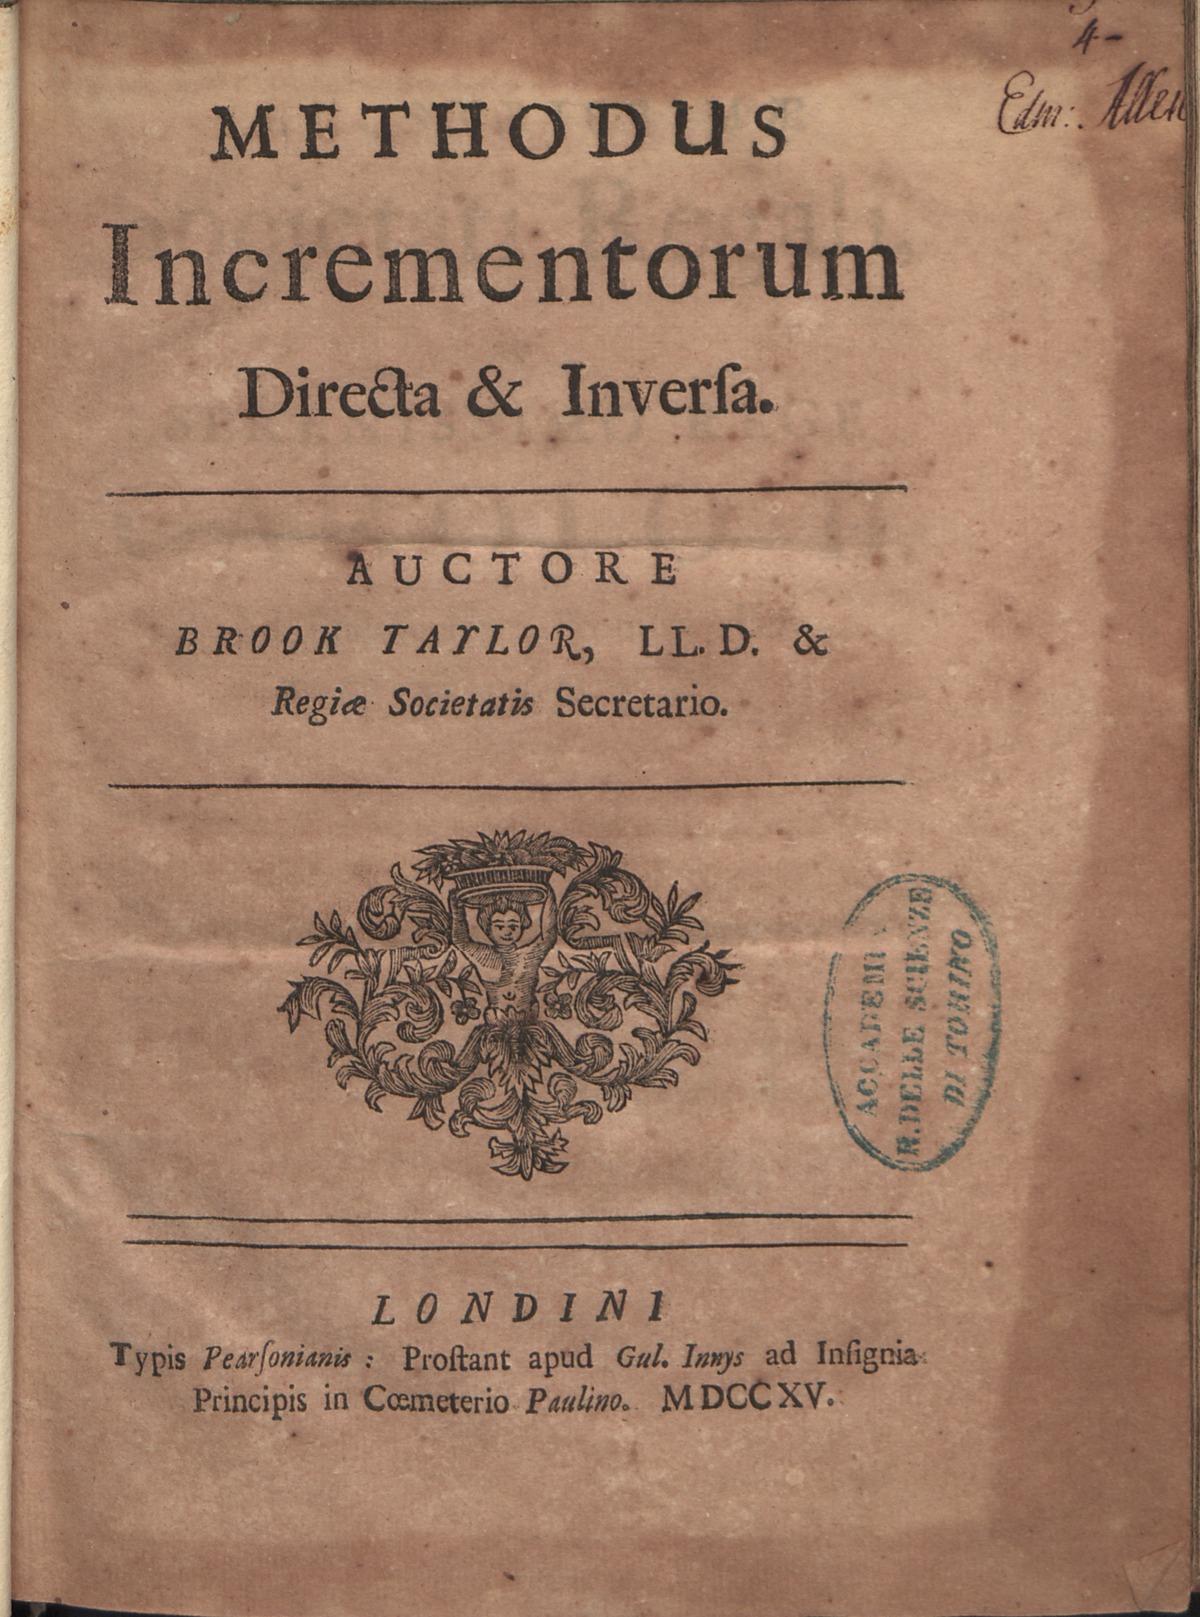 Taylor - Methodus incrementorum directa et inversa, 1715 - 811460.tif